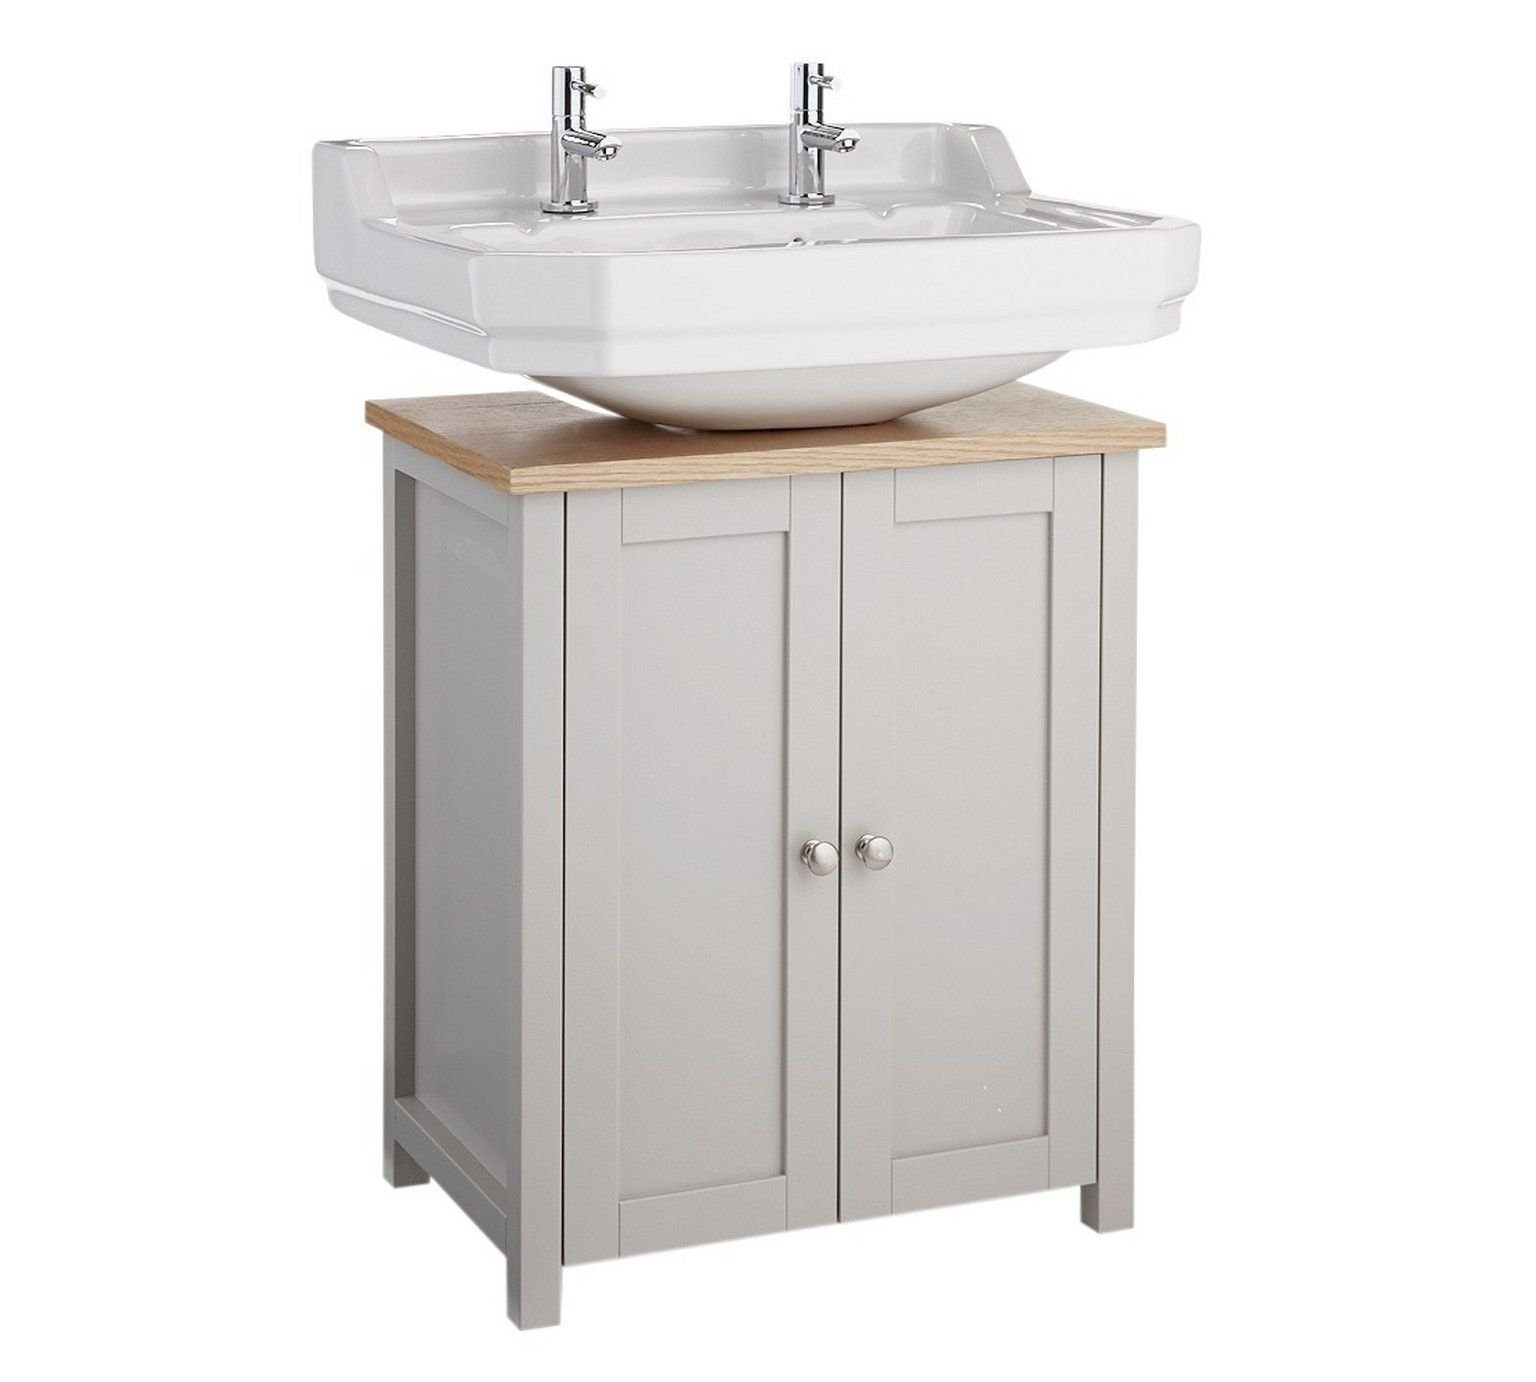 Buy Heart Of House Livingston Undersink Storage Grey Pine At Argos Co Uk Your Online Shop For Bathroom Shelf Decor Bathroom Sink Storage Bathroom Shelves